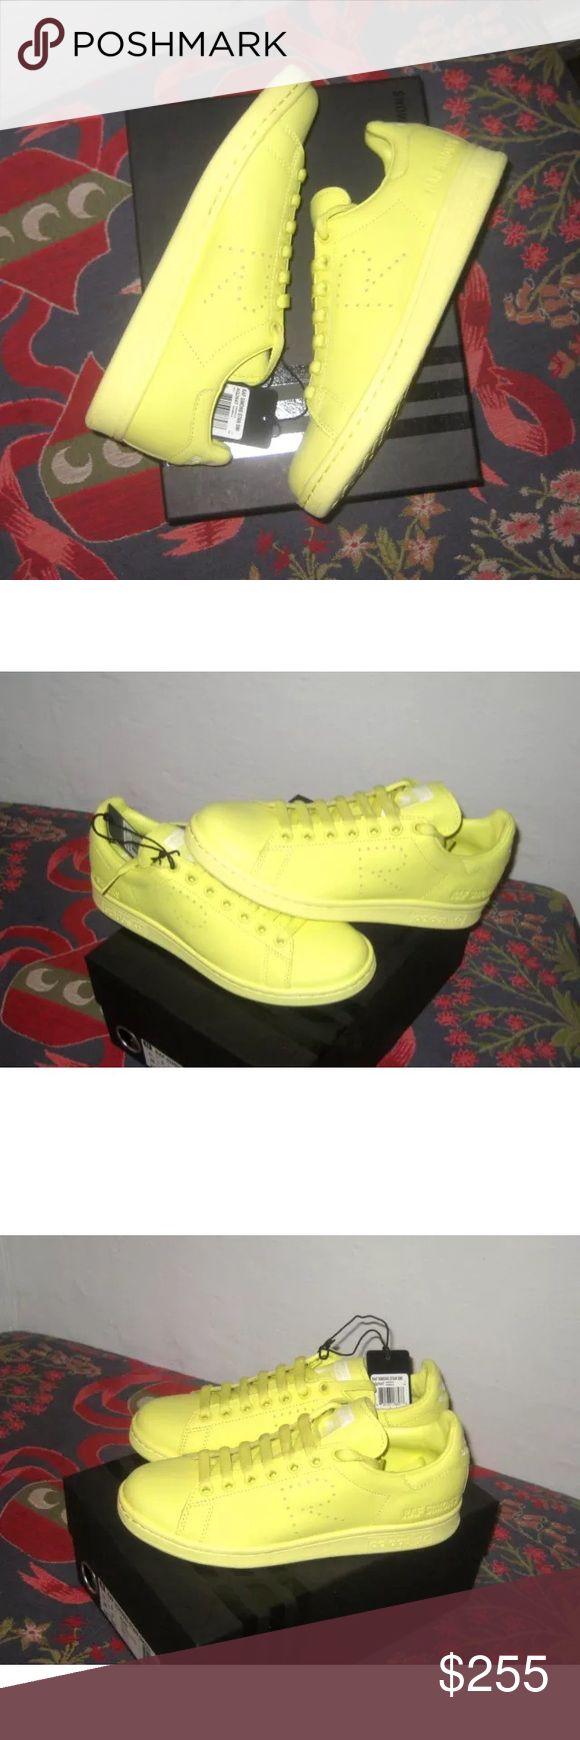 Adidas x Raf Simons Stan Smith Blush Yellow Brand New Size 5.5 Adidas Shoes Sneakers